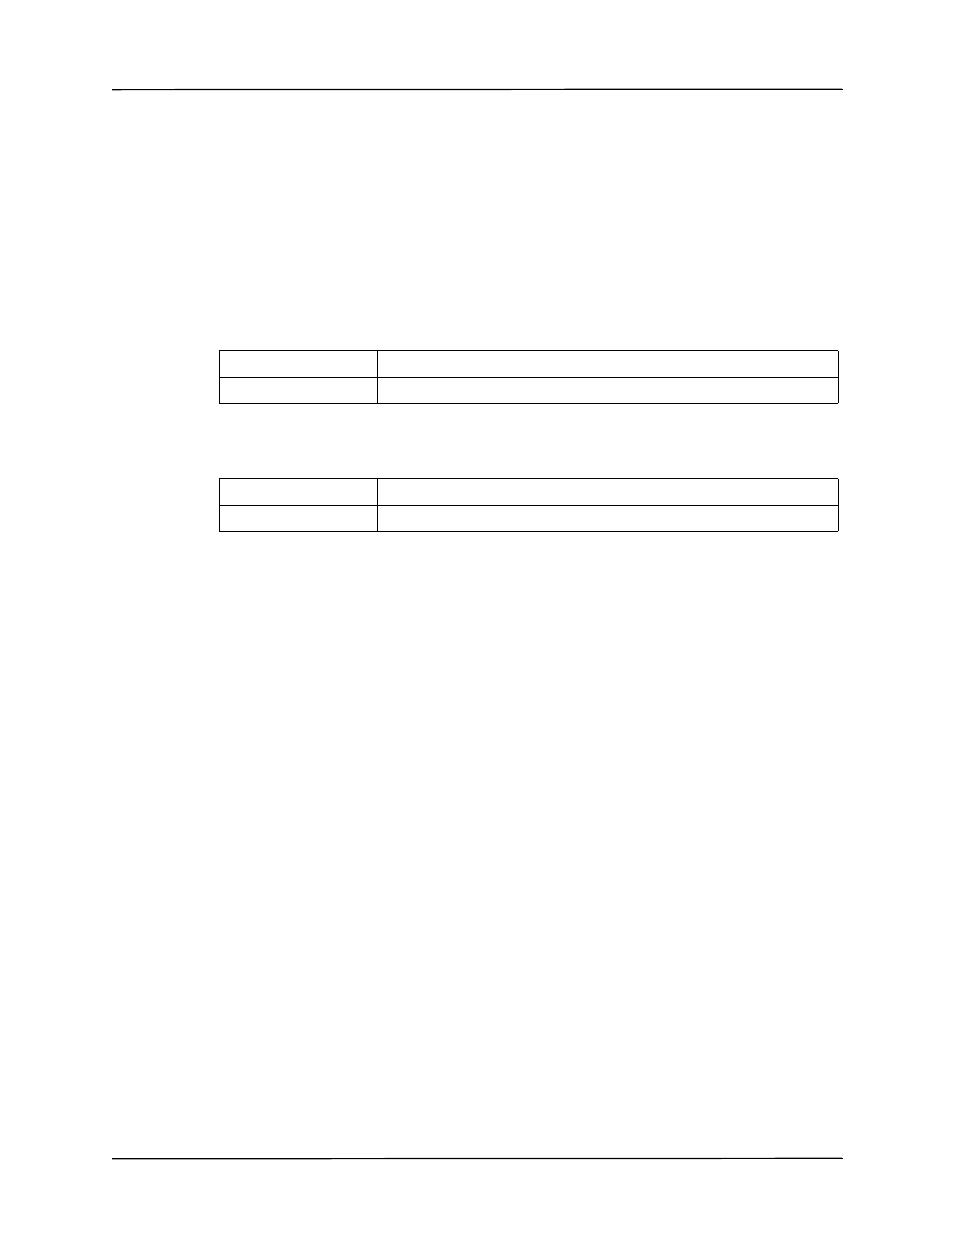 Log clear code | ZOLL X Series Monitor Defibrillator Rev B